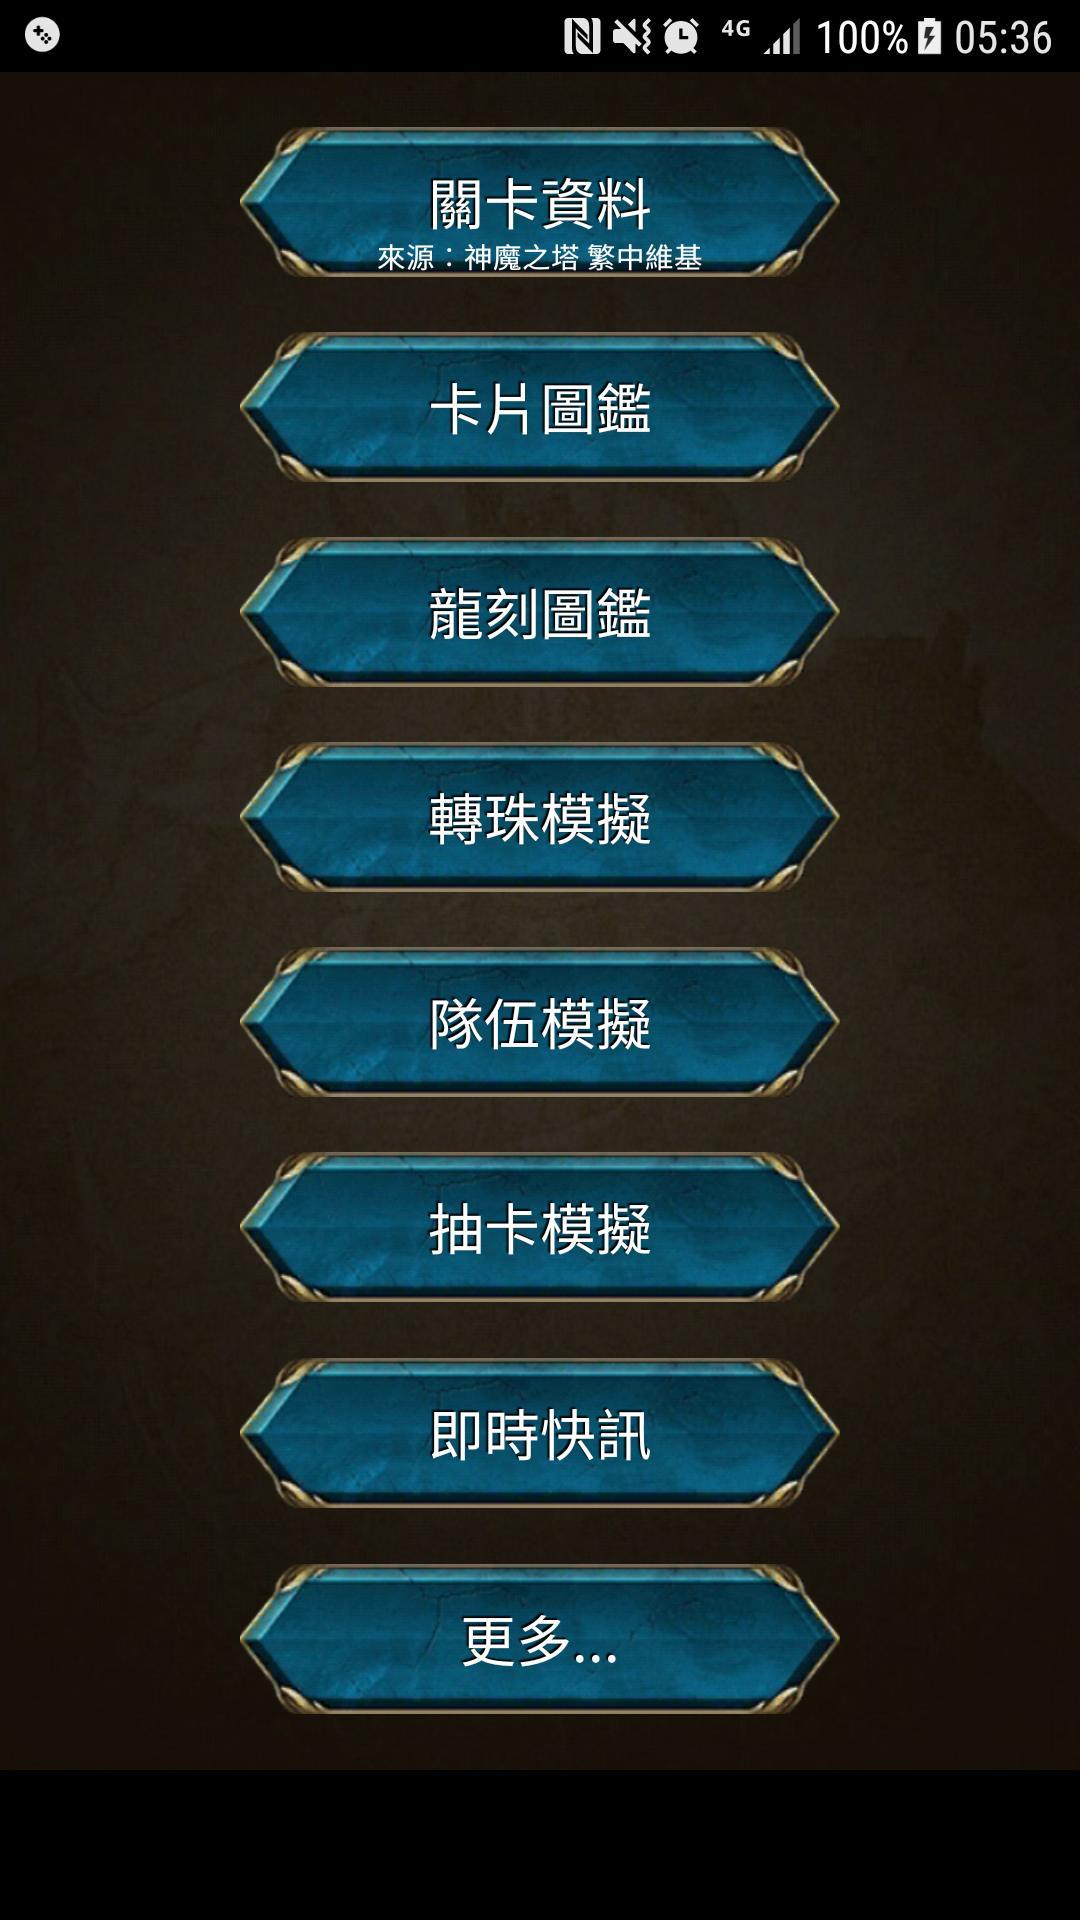 卡片圖鑑for神魔之塔 11.1.38 Screenshot 1